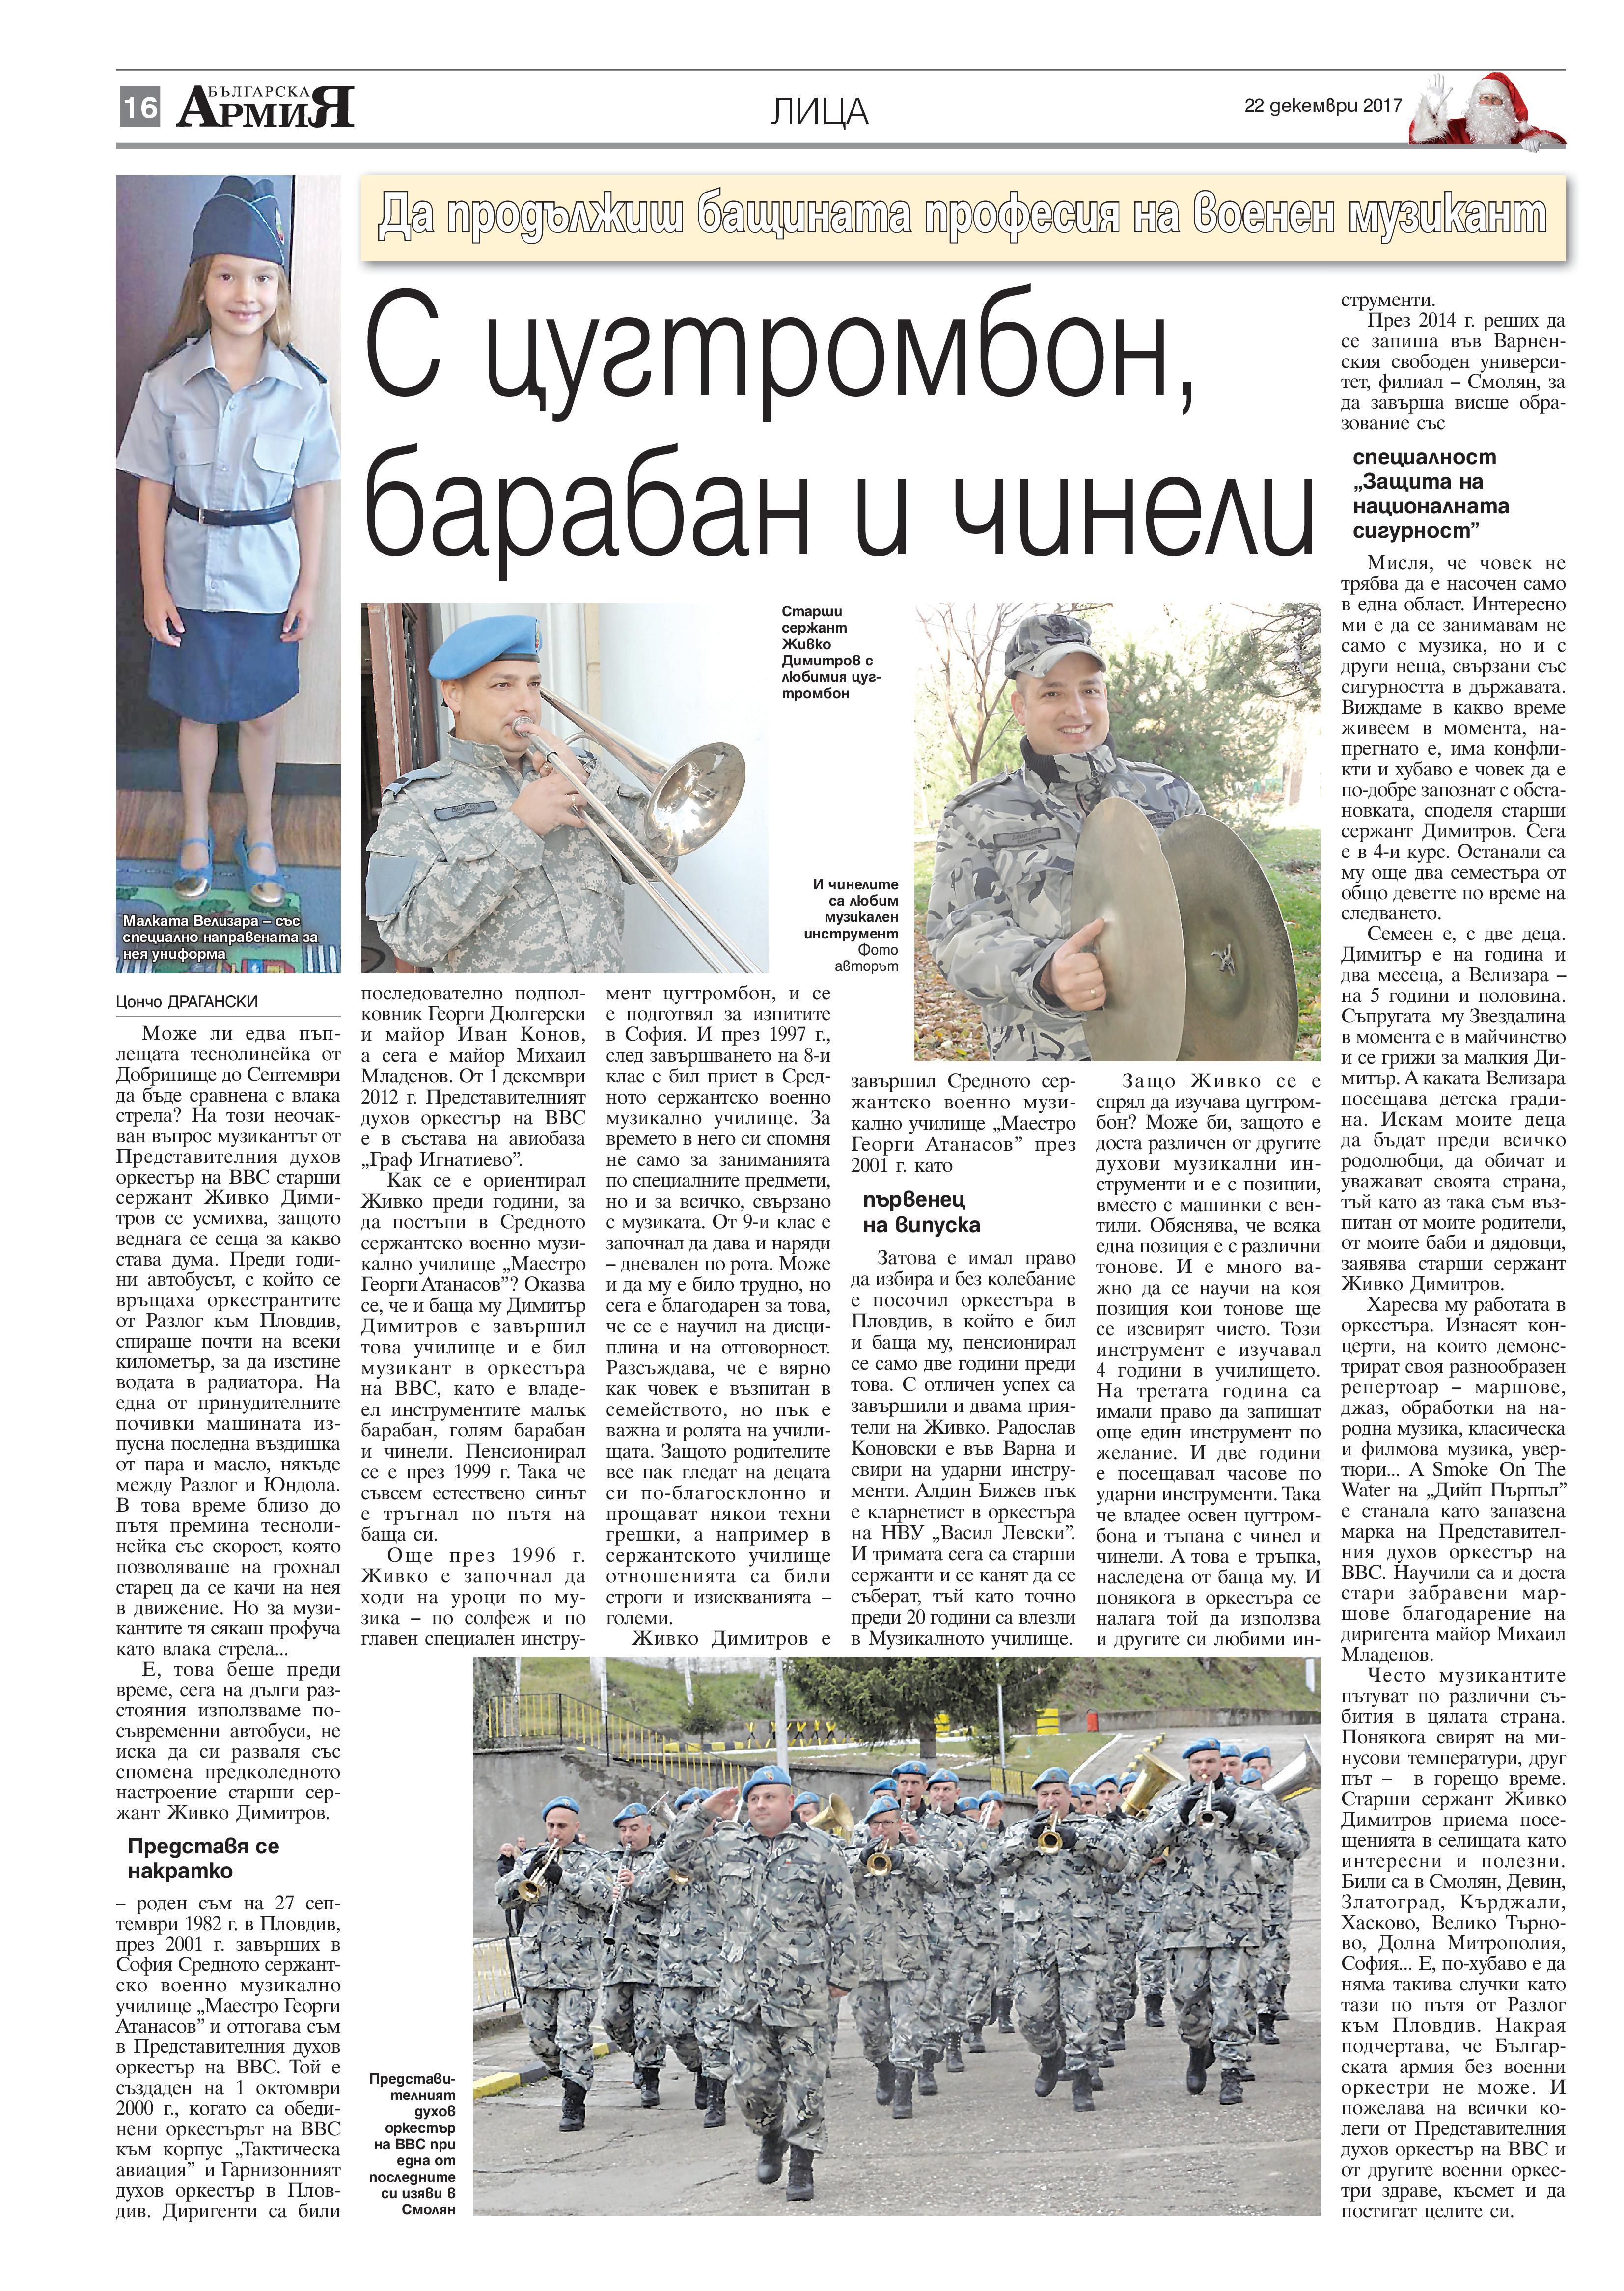 http://armymedia.bg/wp-content/uploads/2015/06/16-16.jpg